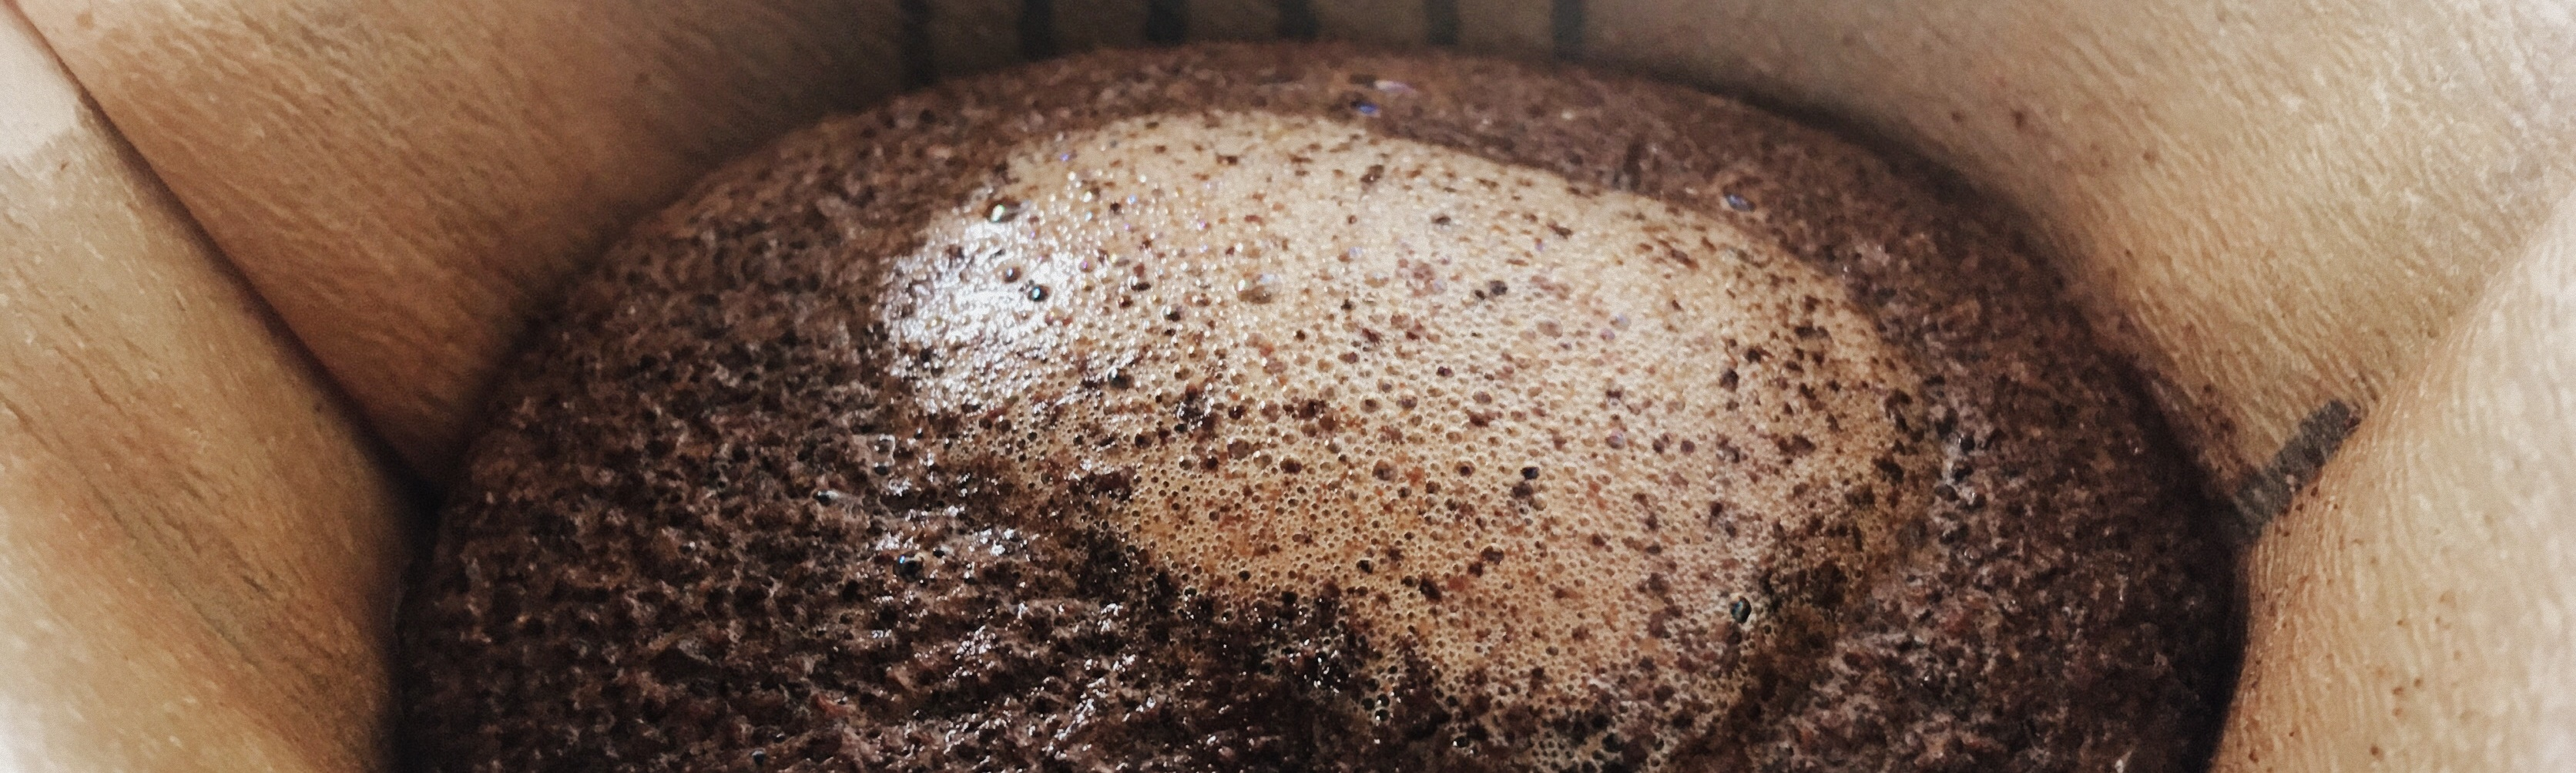 slide_coffee4